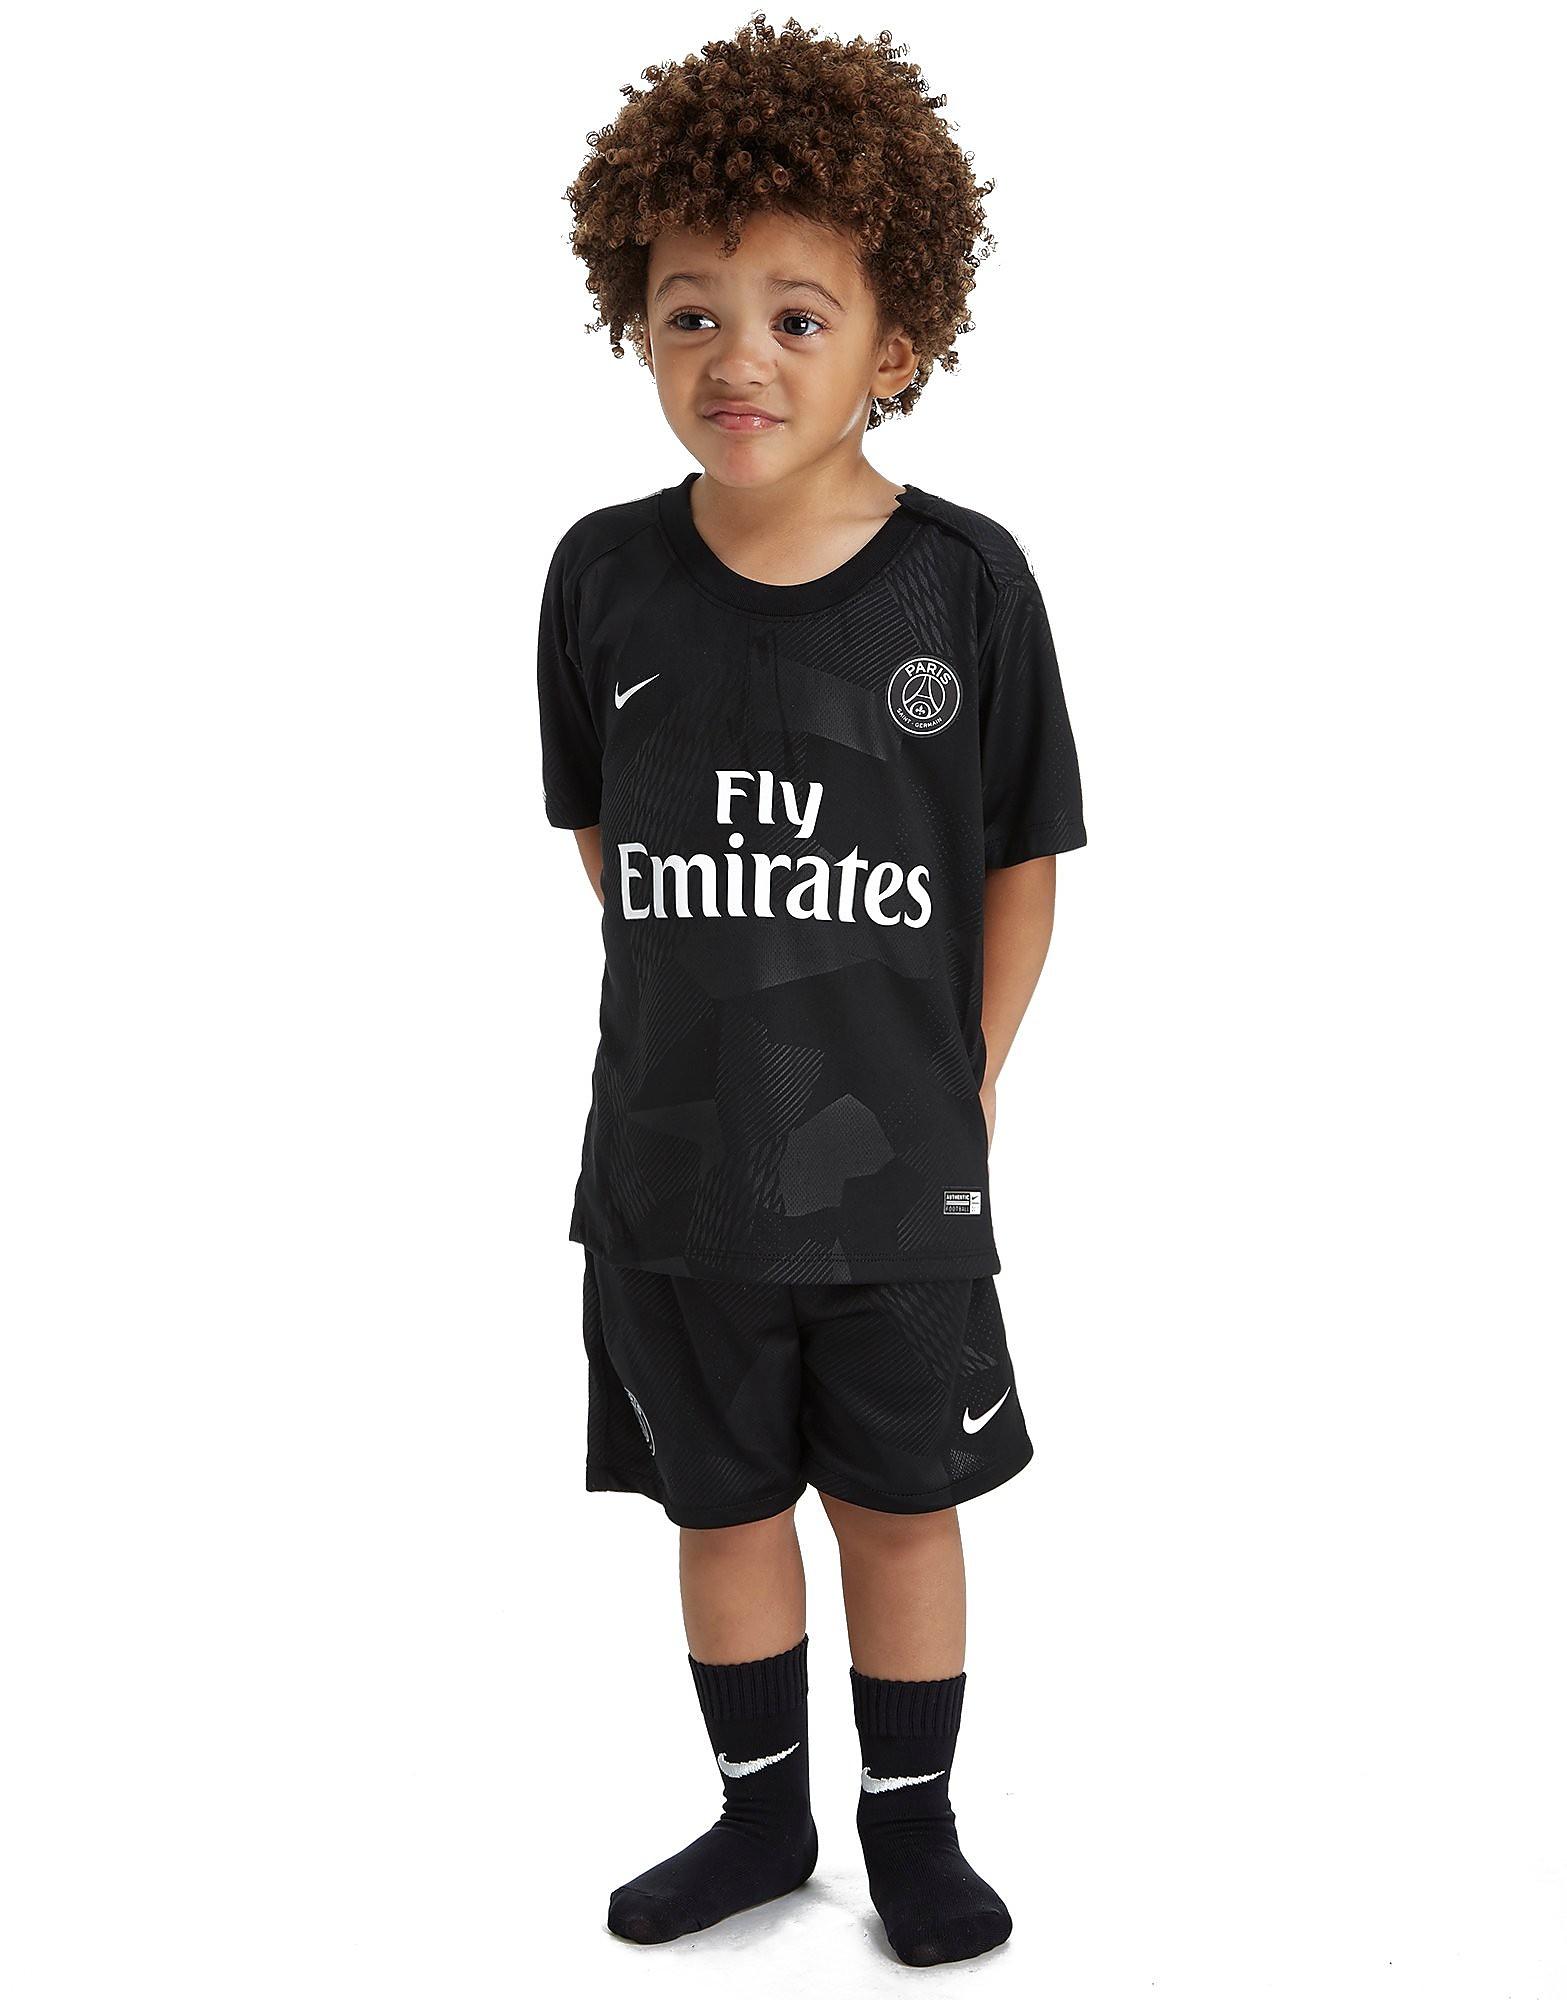 Nike Ensemble Paris Saint Germain 2017/18 Third Kit Bébé